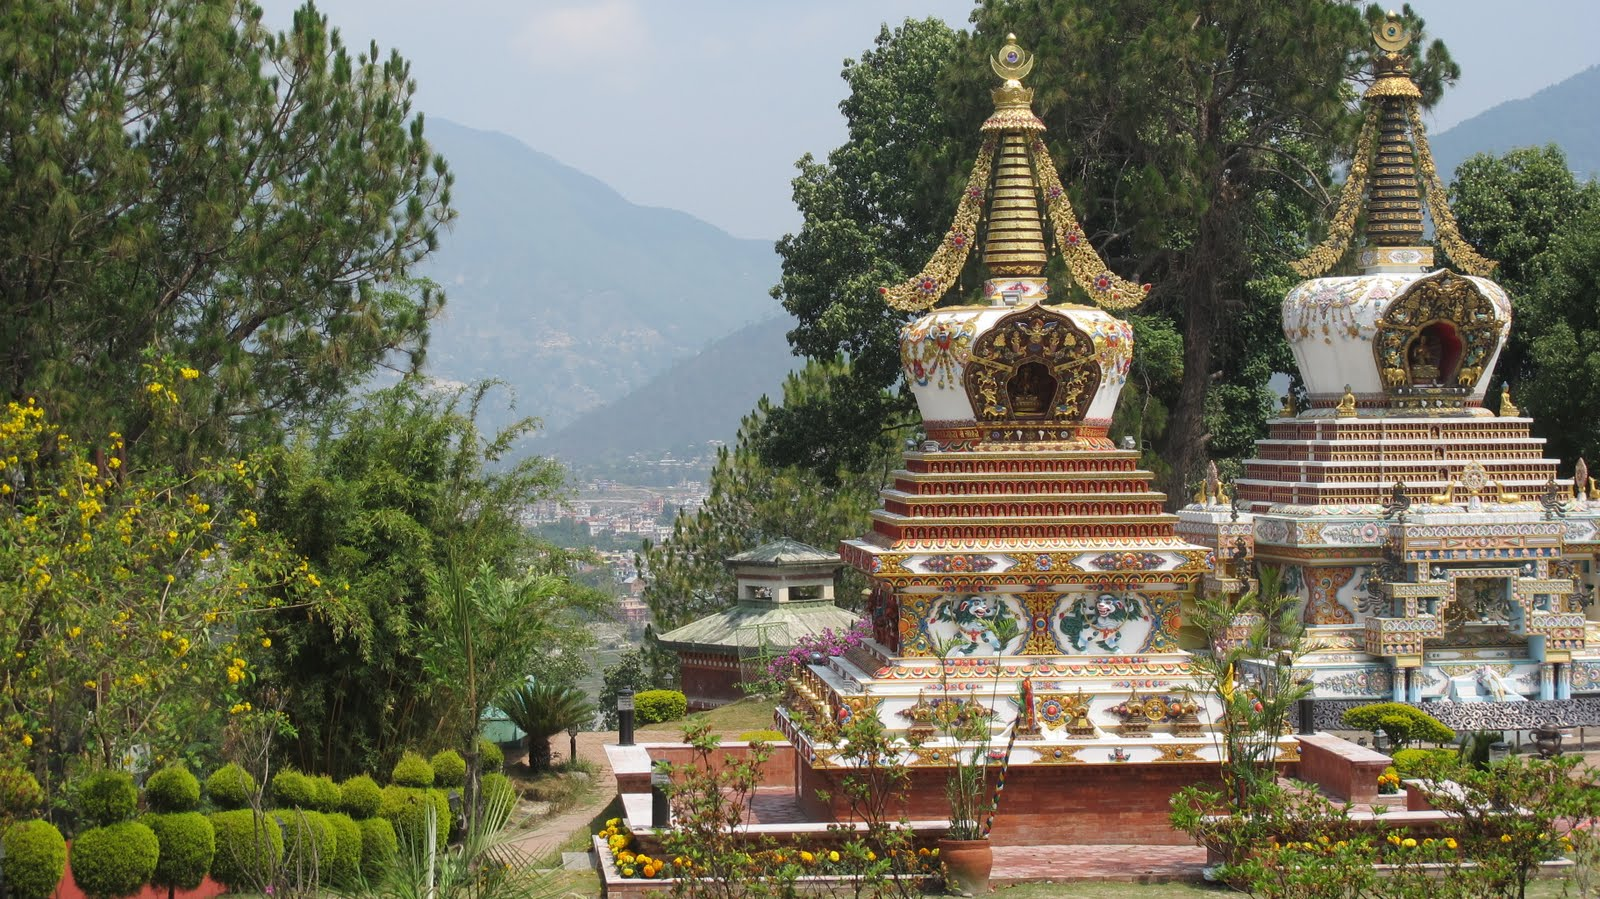 """Two Friends,"" Khensur Lama Lhundrup's stupa next to Geshe Lama Konchog's stupa at Kopan Monastery, Nepal."